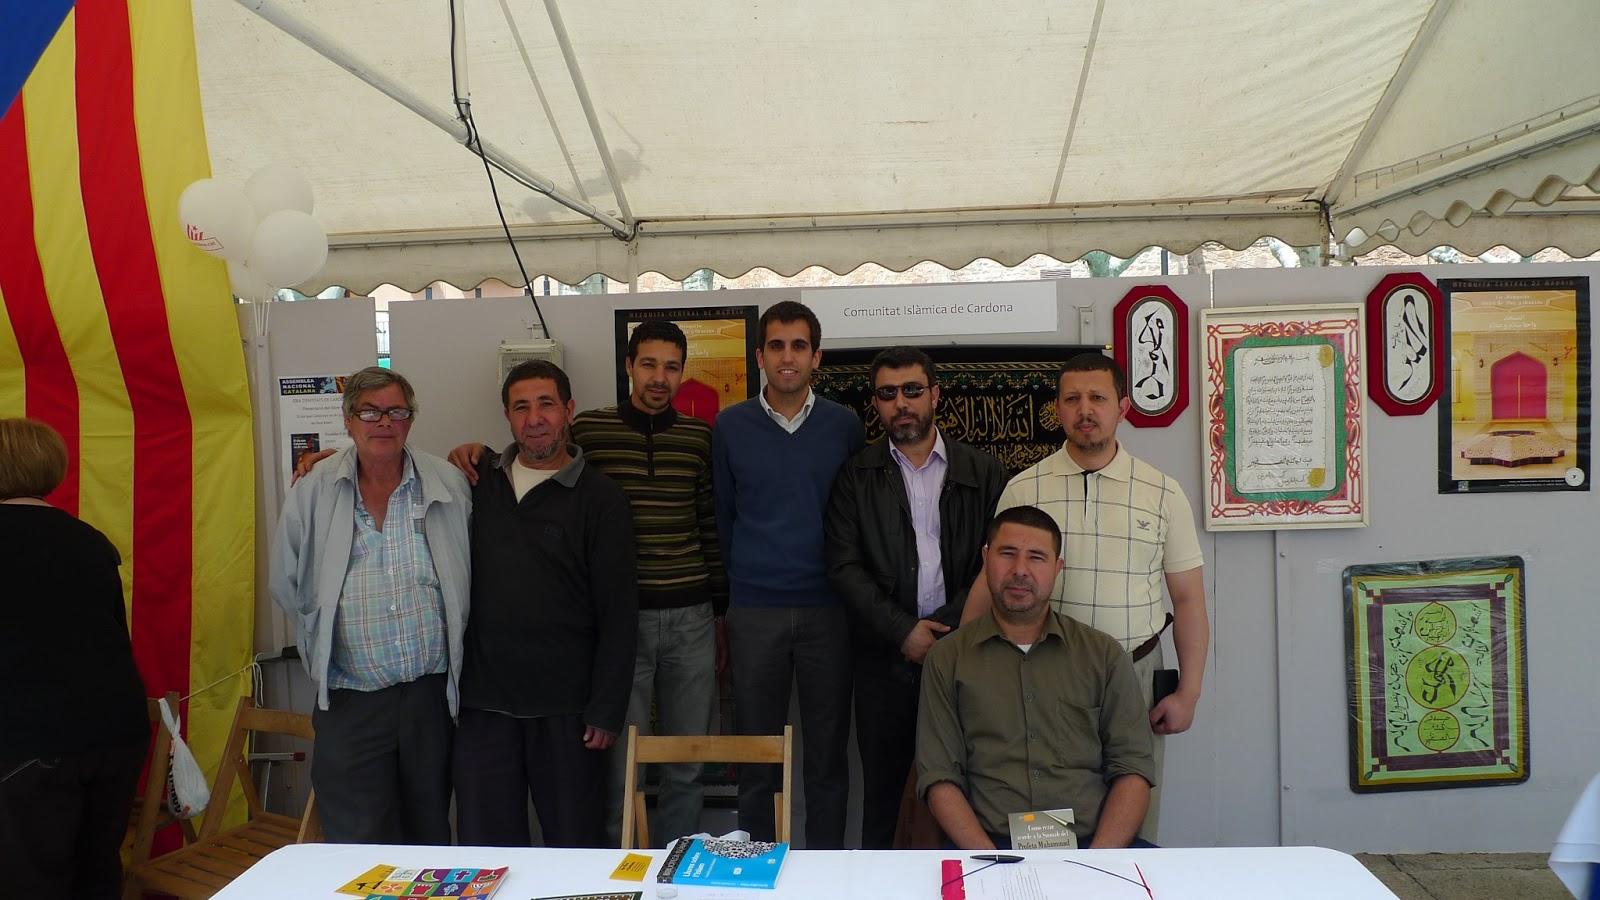 UCIDCAT visita a la Feria de Entidades del municipio de Cardona